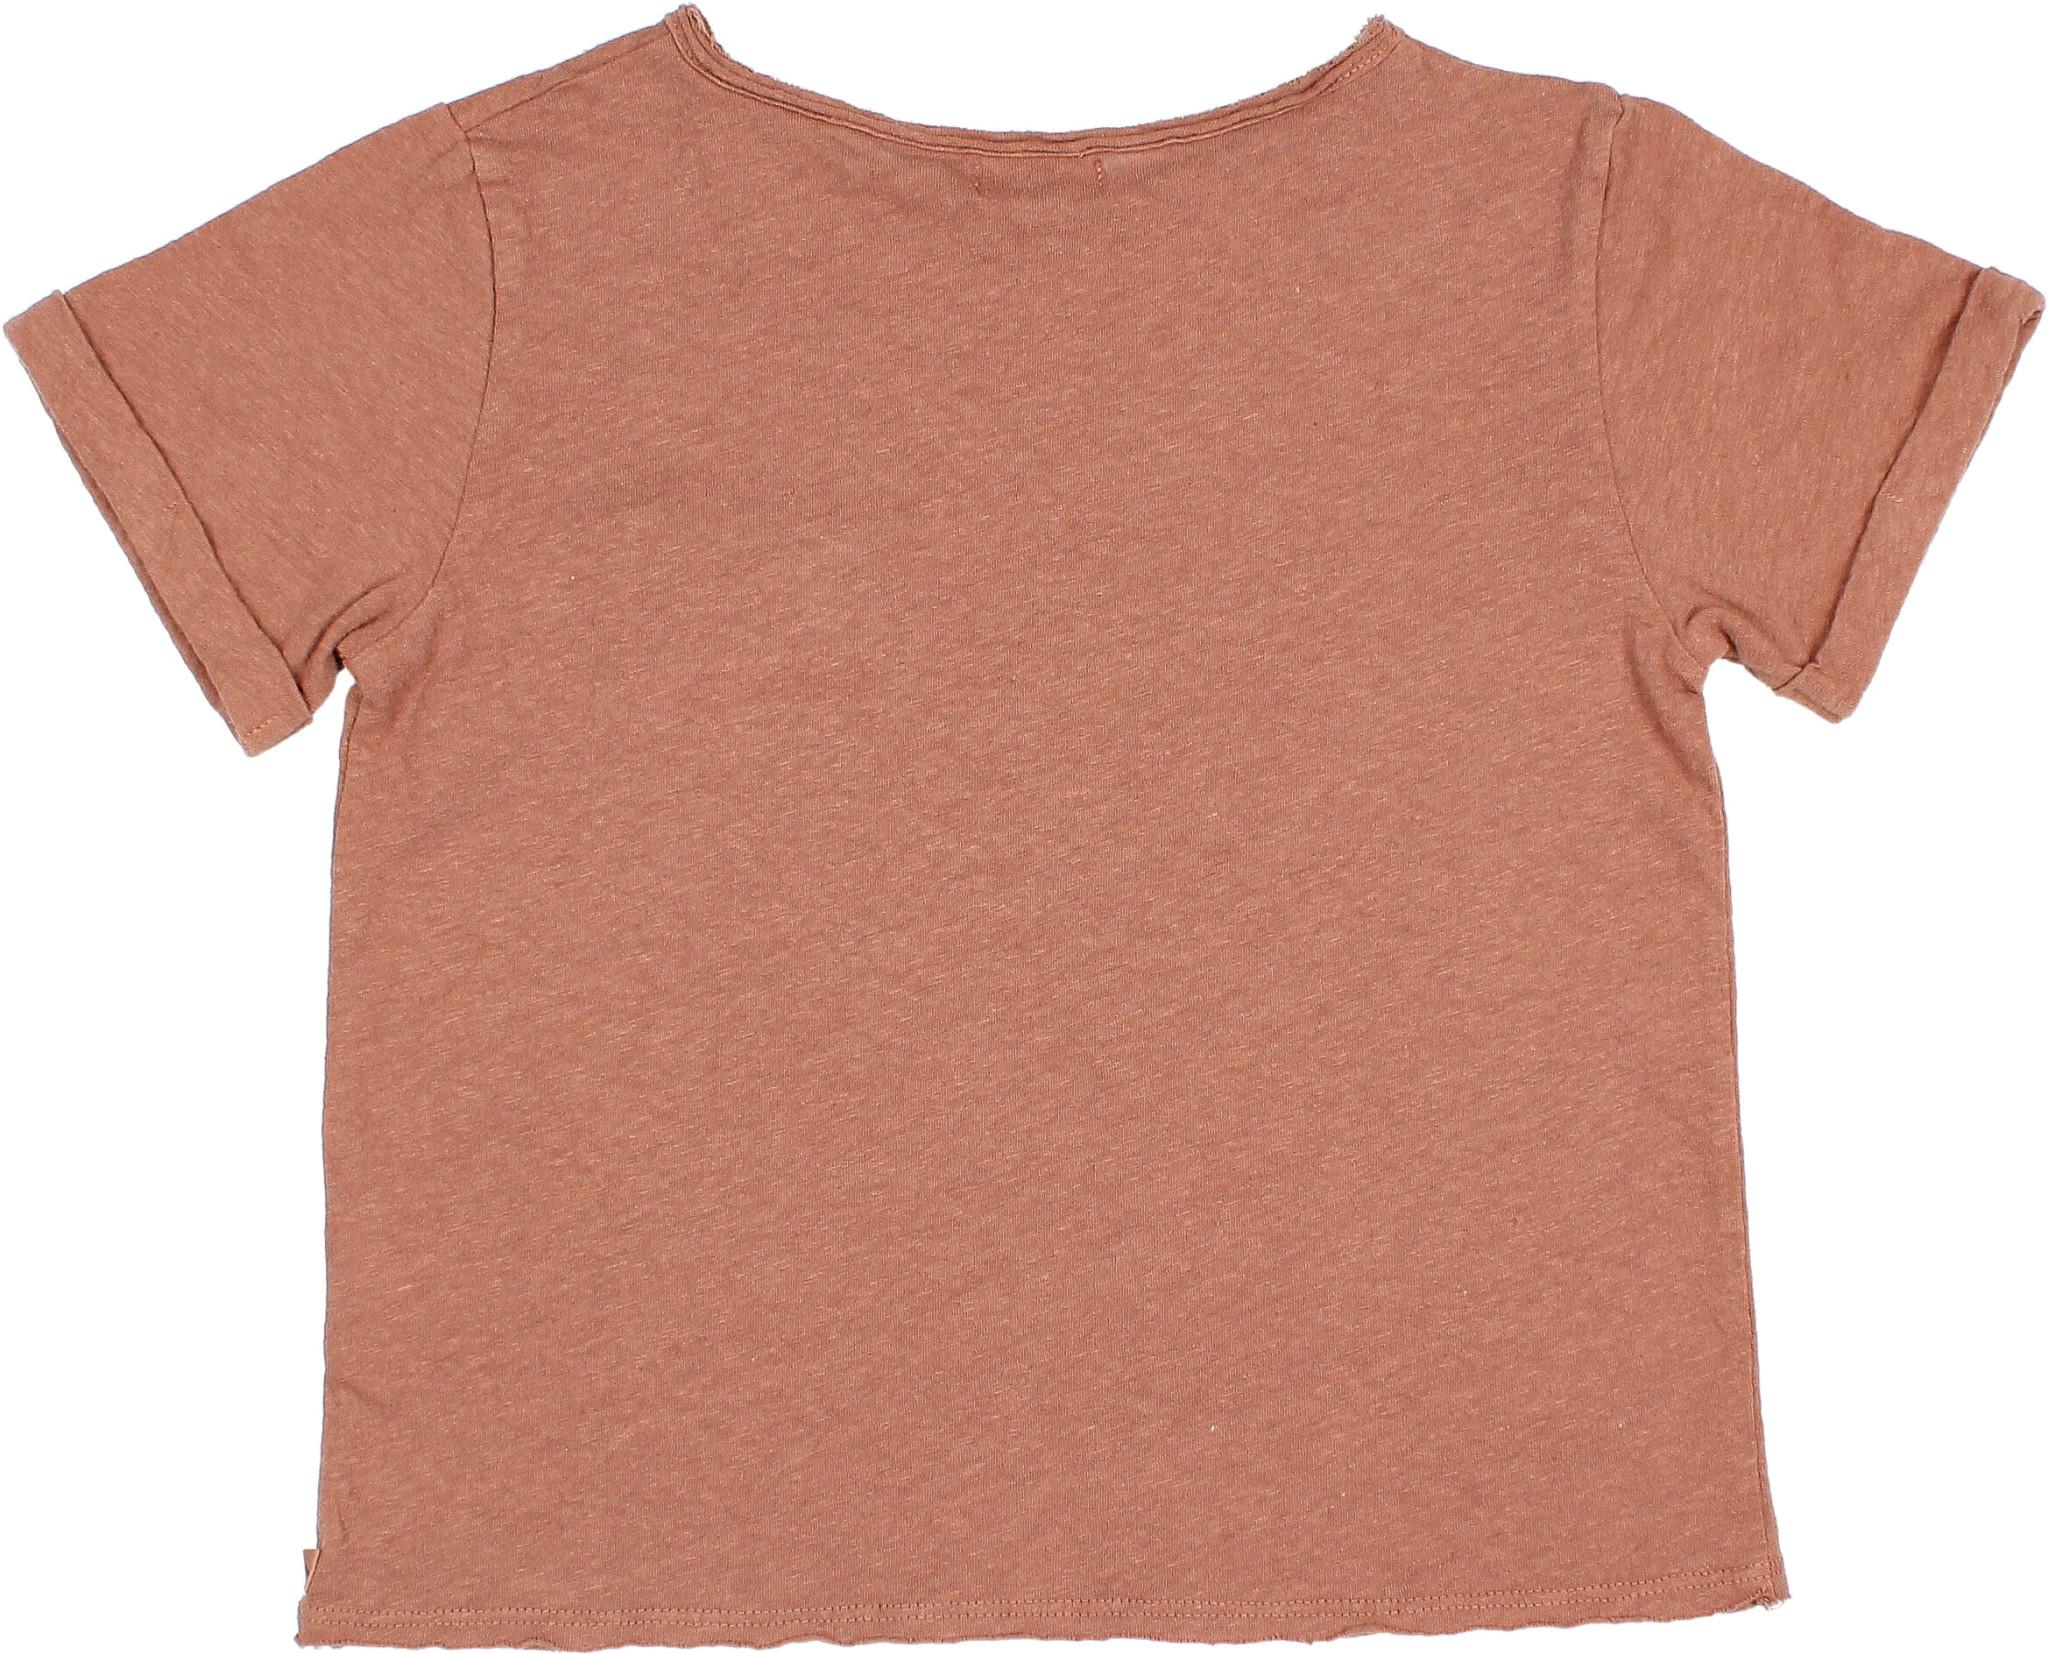 James t-shirt cocoa-5